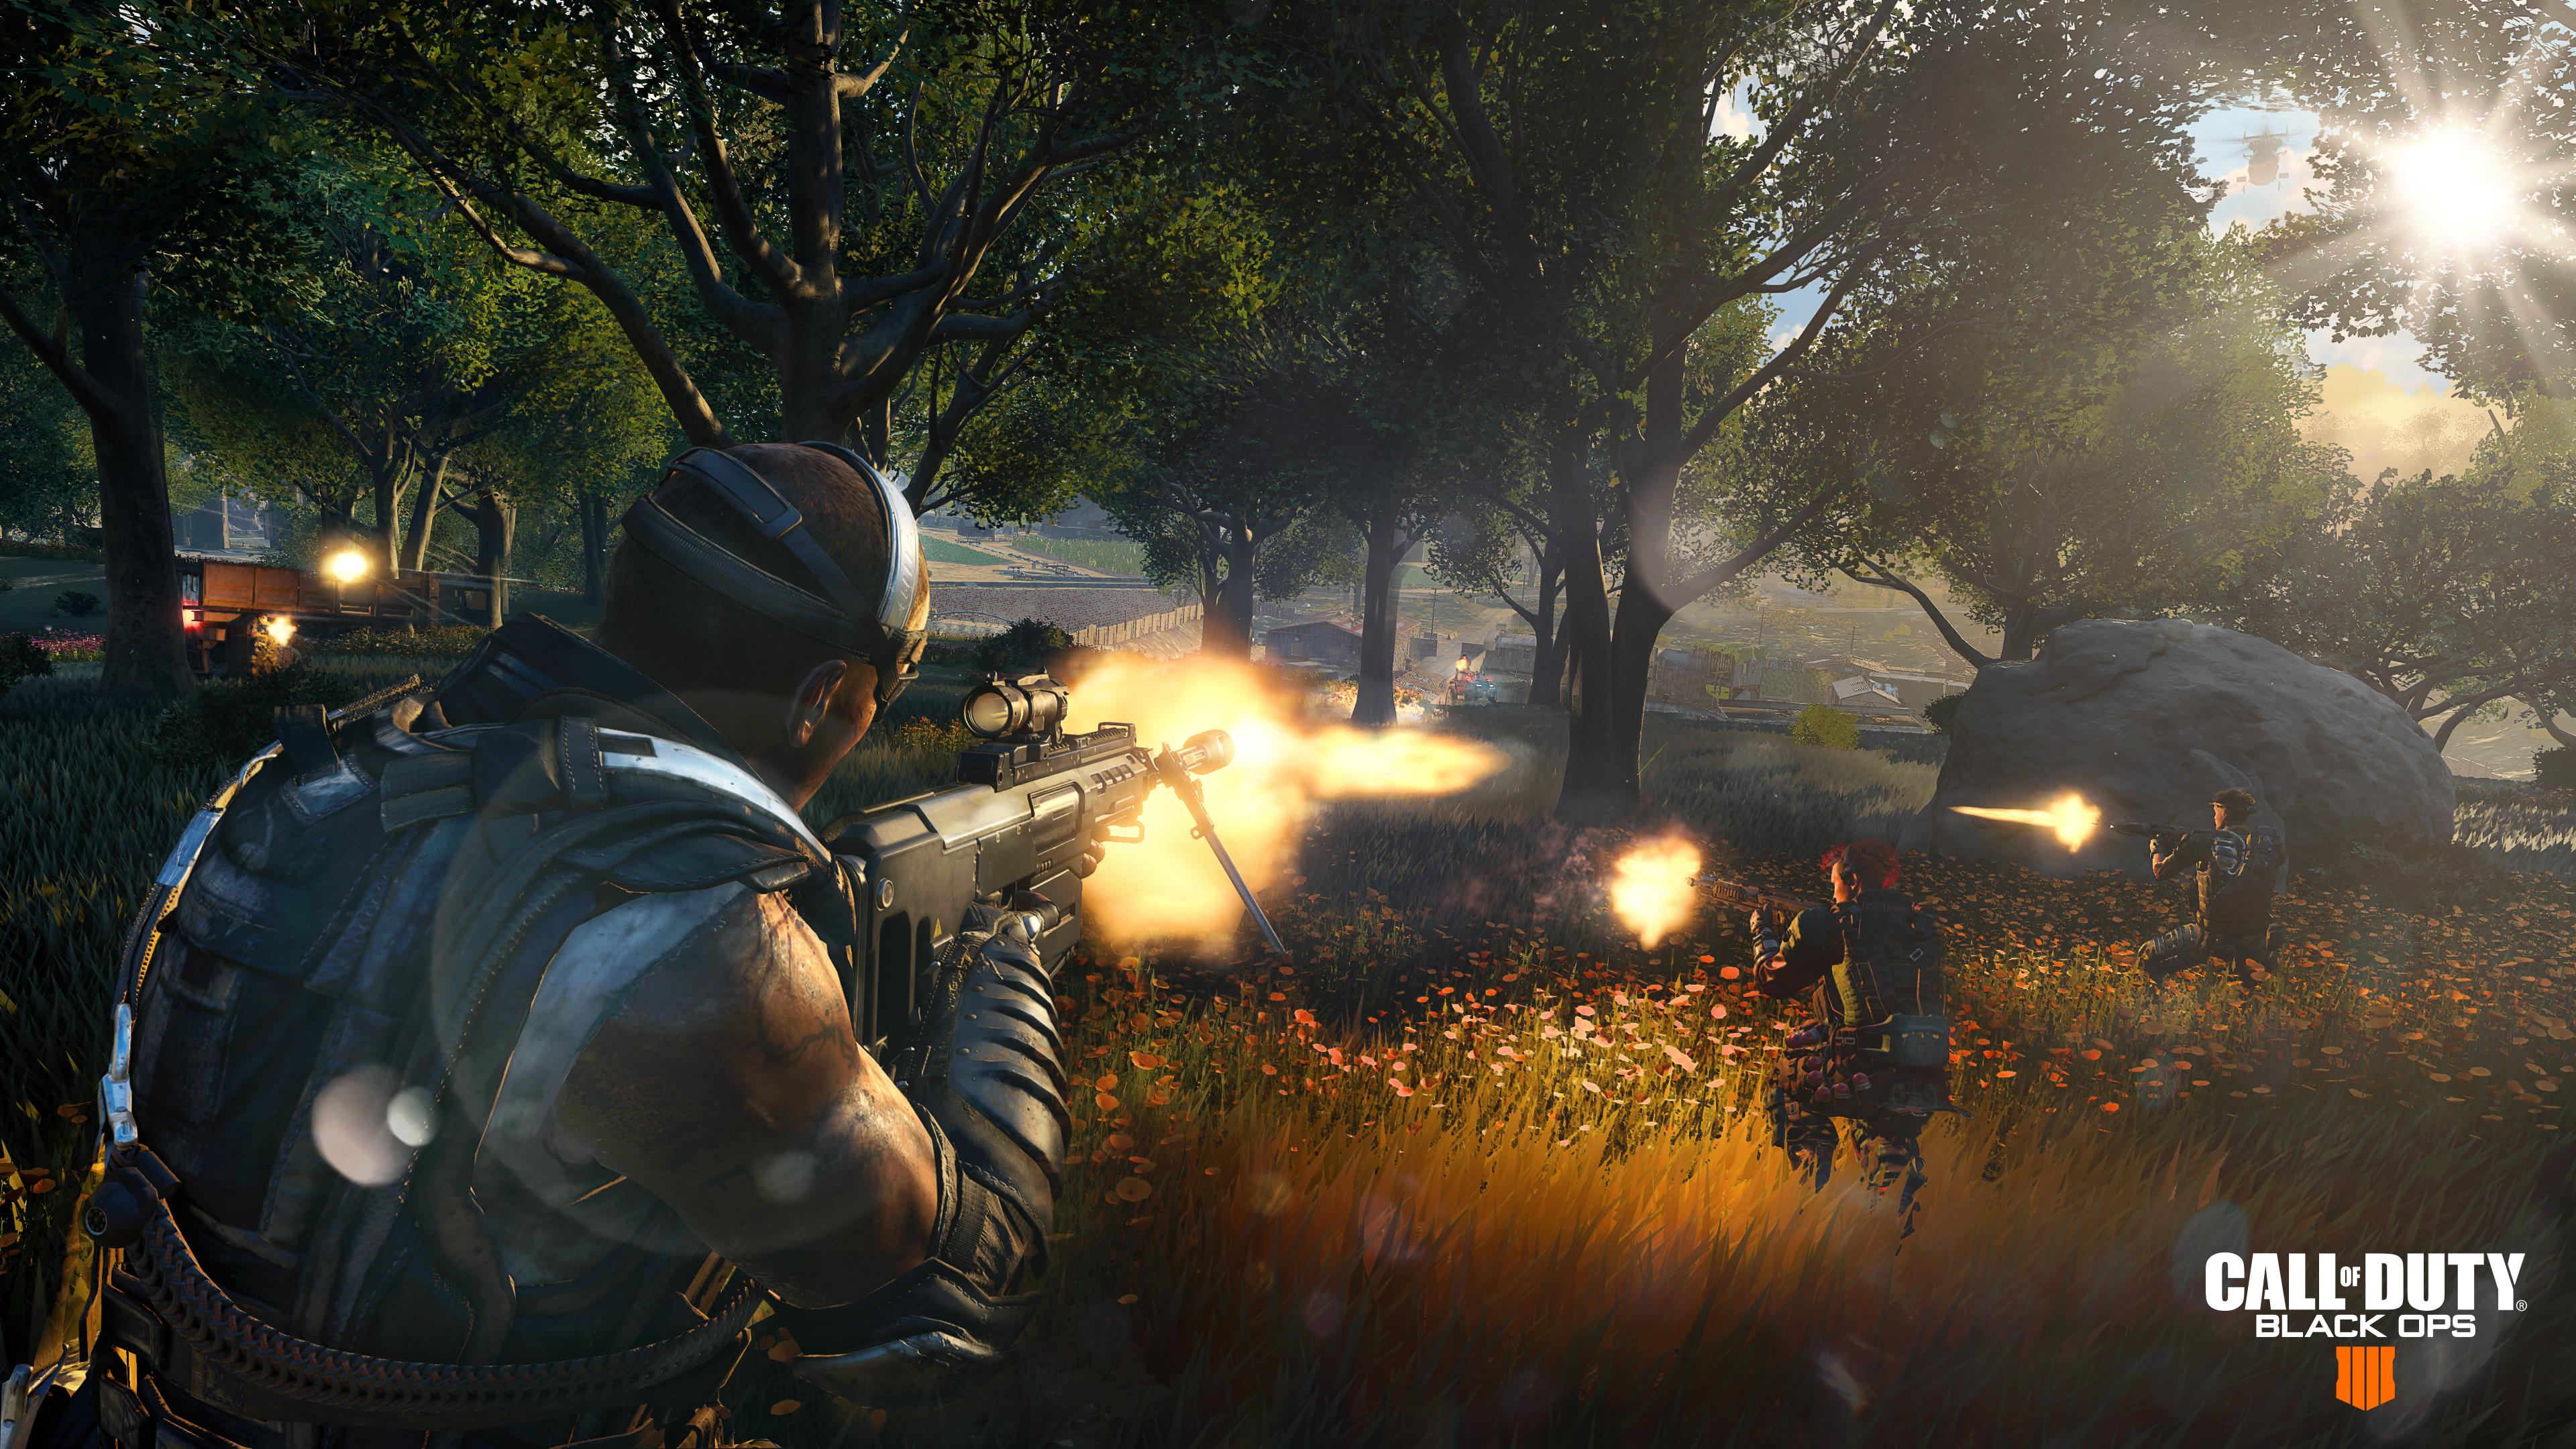 Black Ops 4 - Blackout screenshot 2